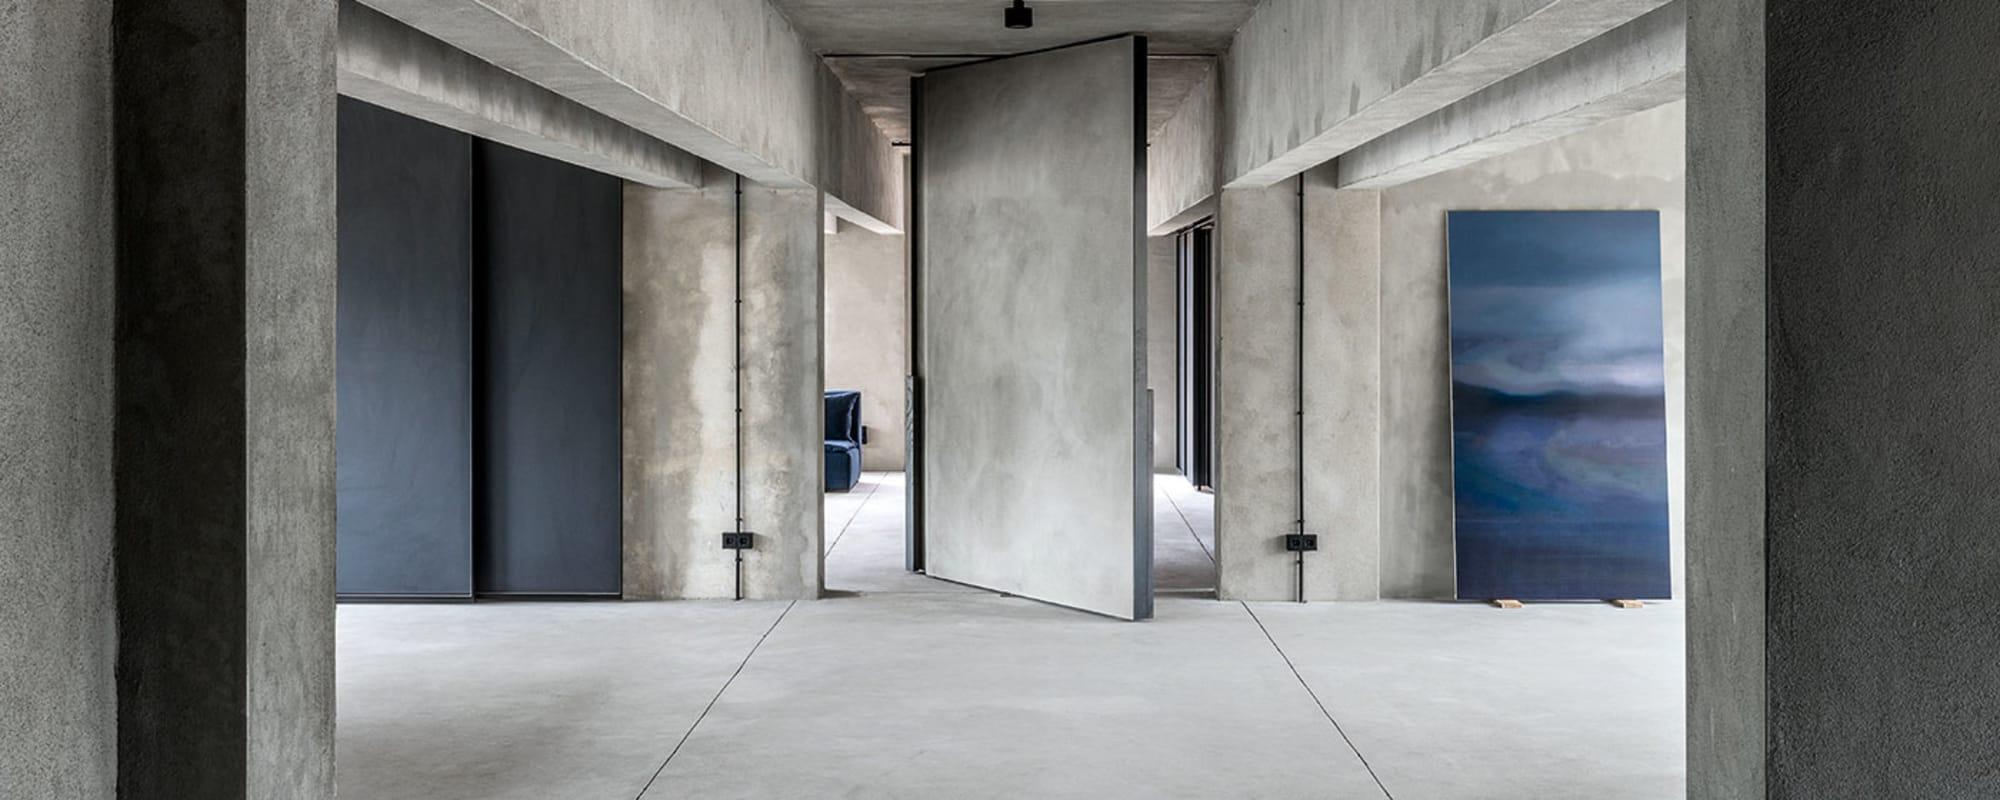 Plattenbau, Berlin, Beton, Architektur, Kollektiv